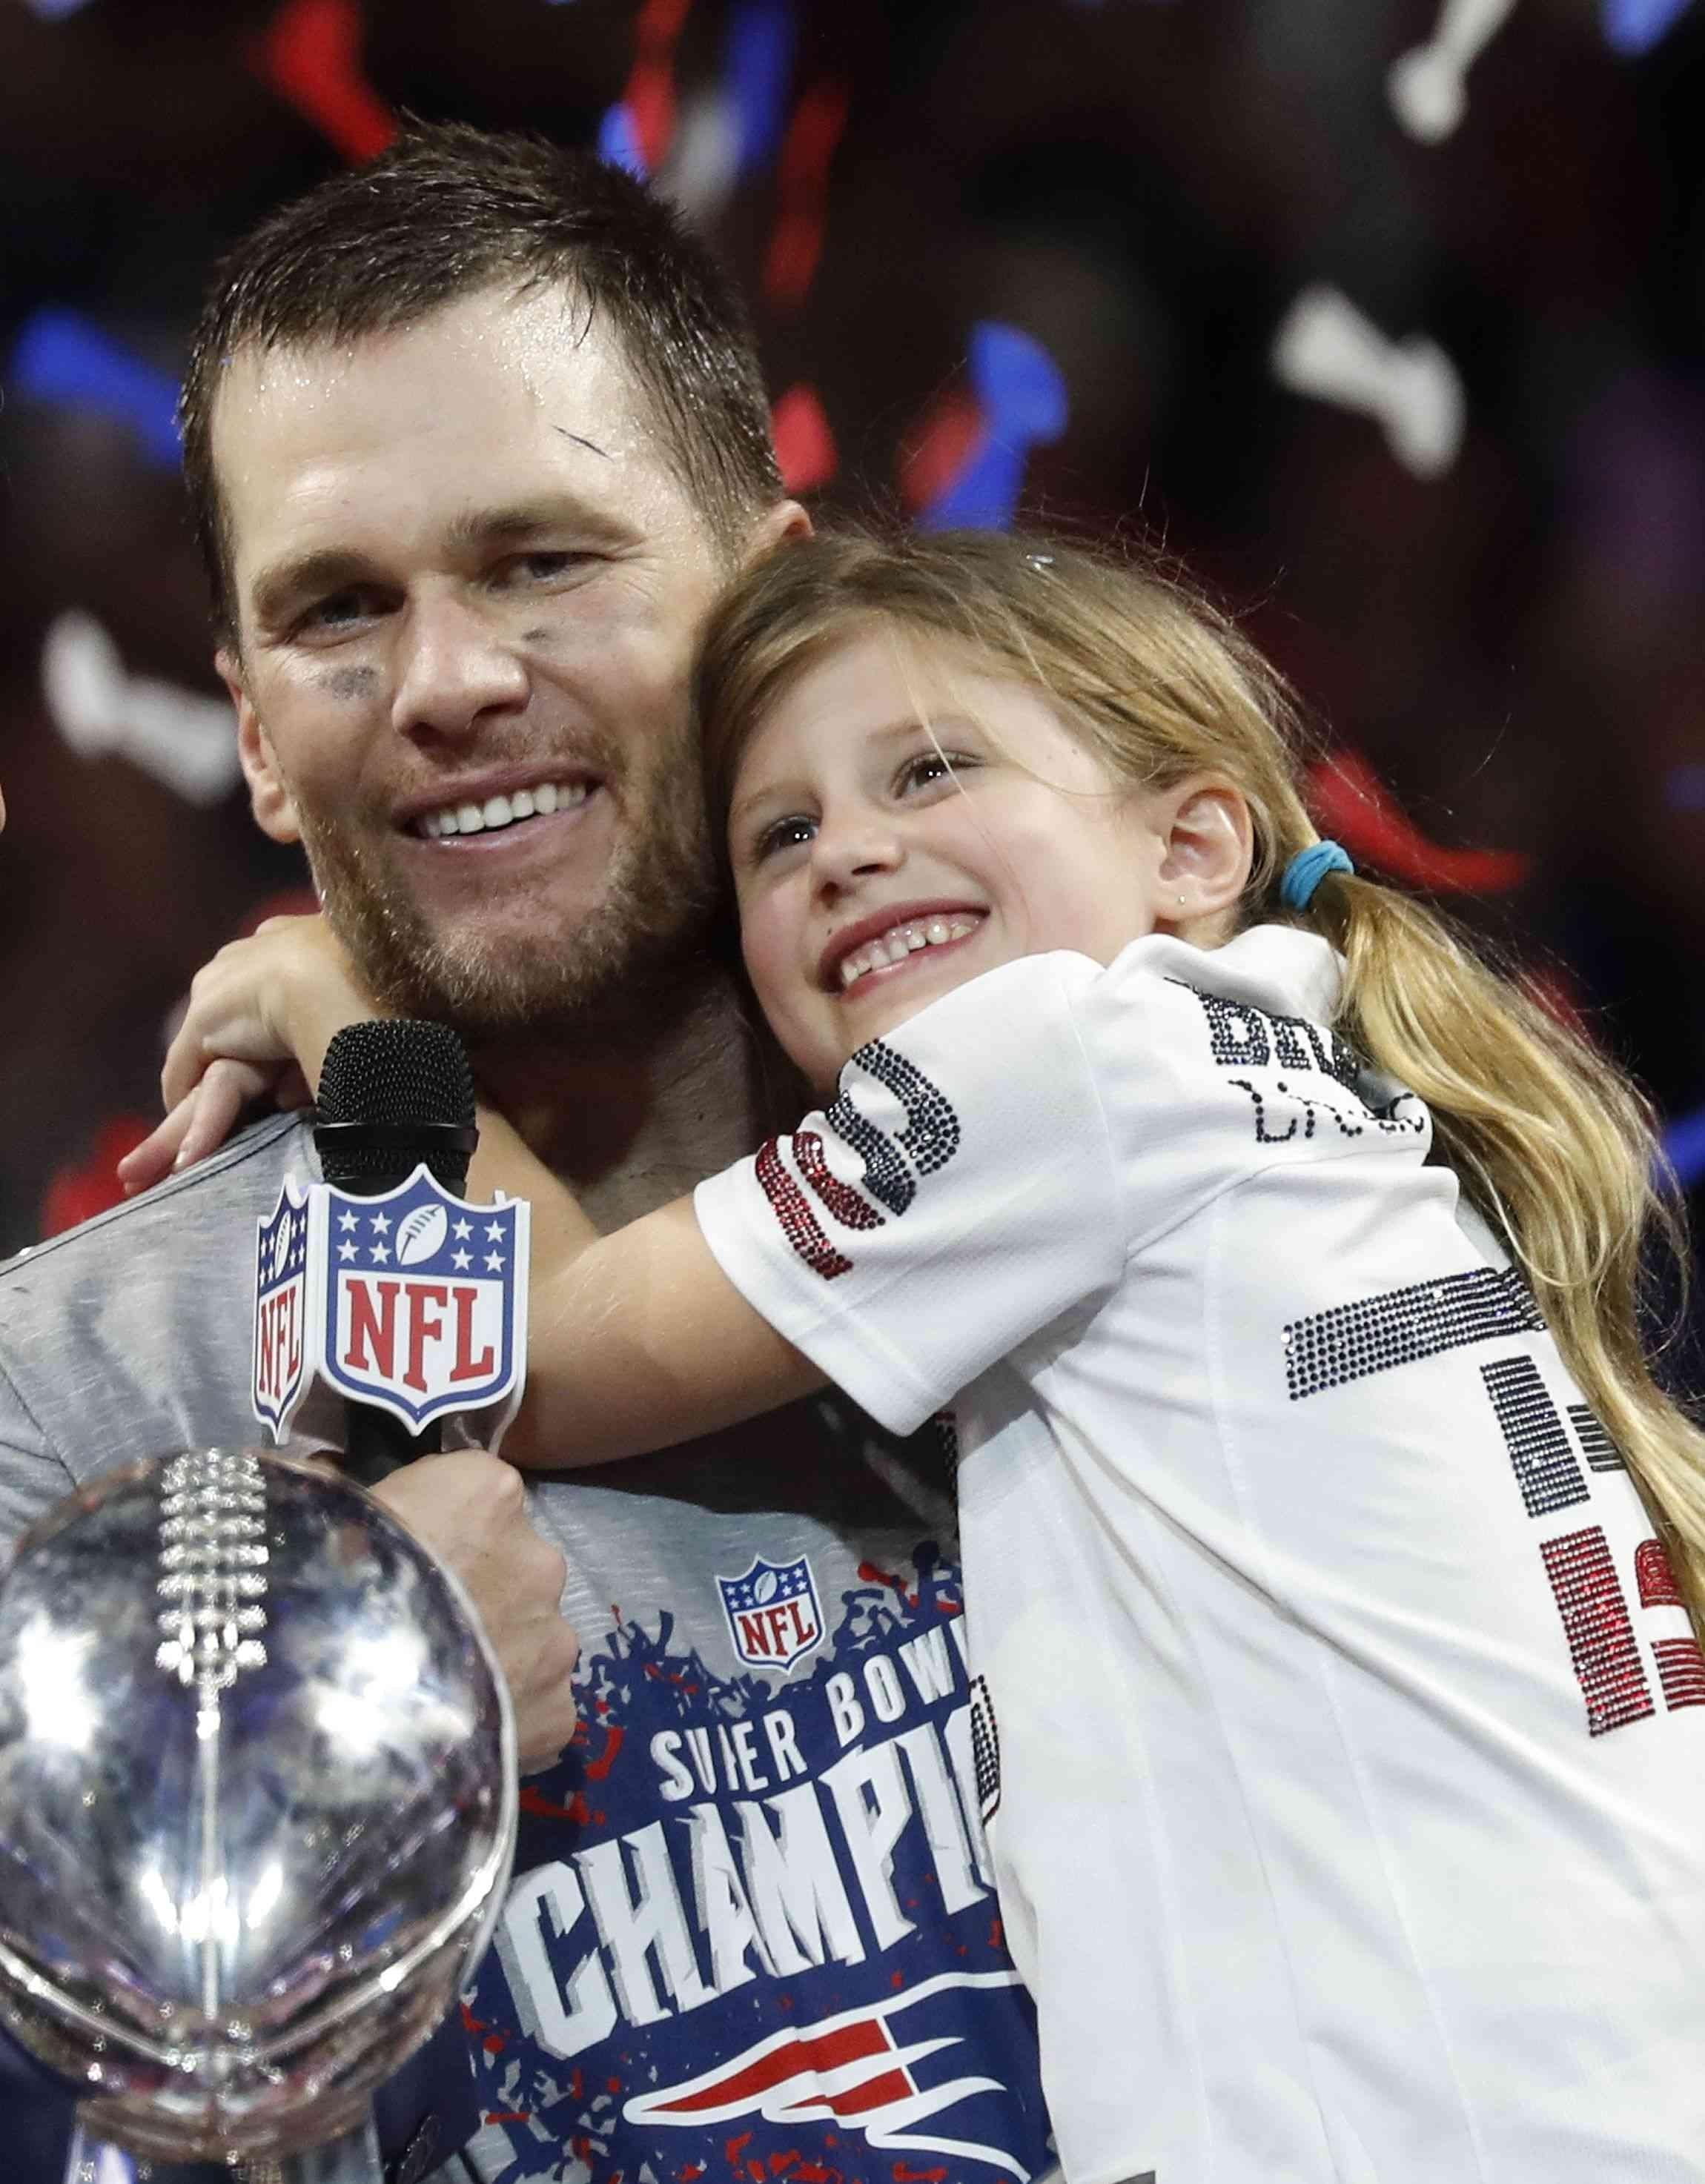 Super Bowl 2019: Tom Brady Feiert 6. Titel Mit Seiner with Tom Brady Super Bowl 2019